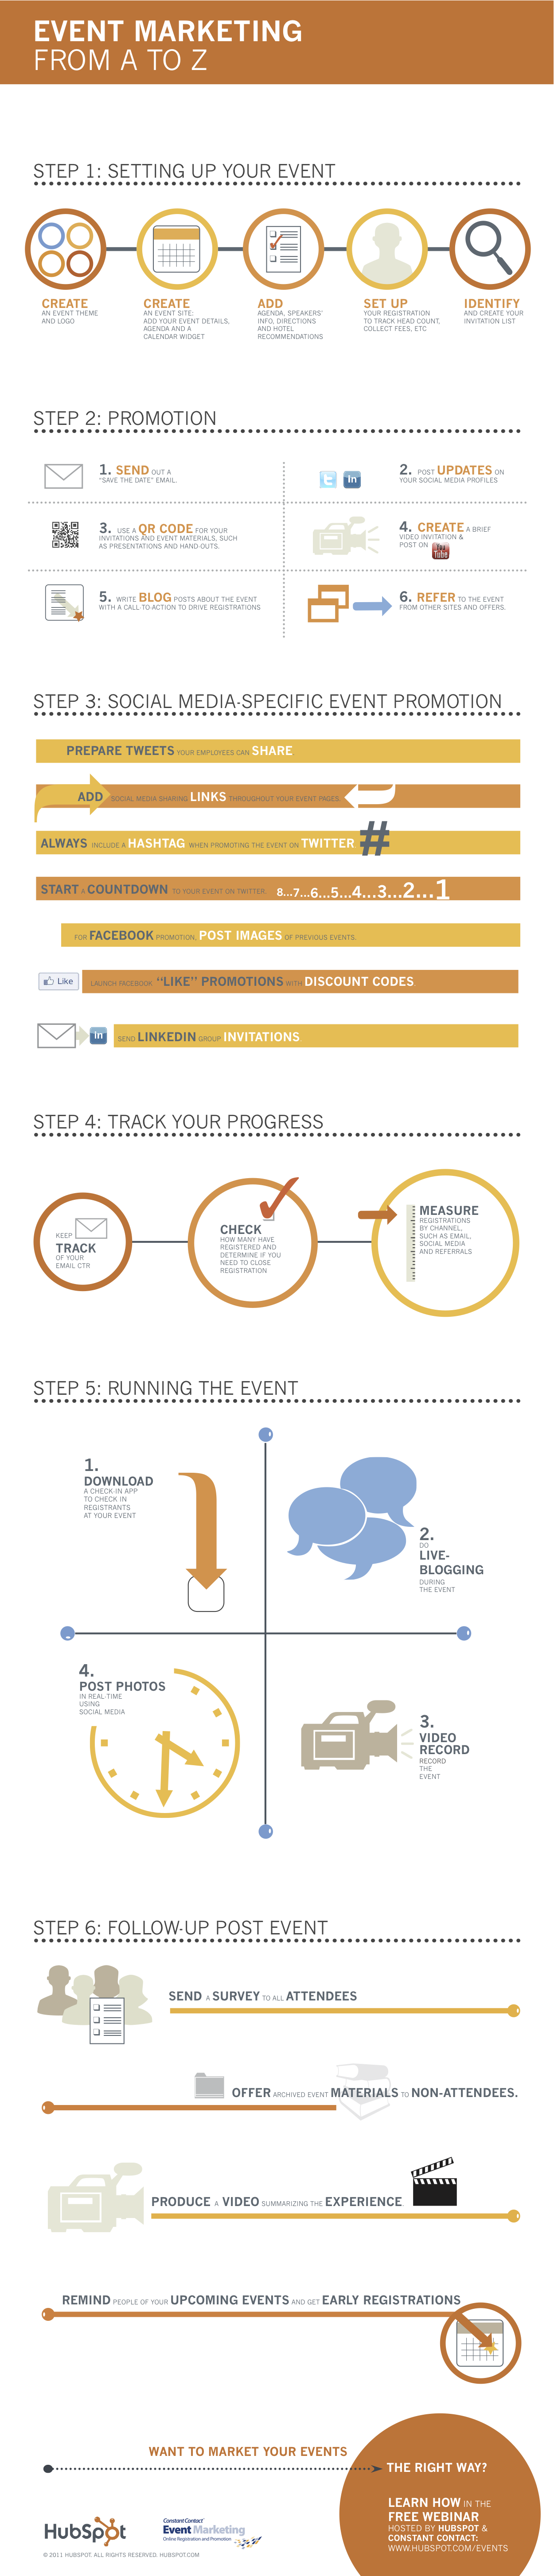 Event Marketing Infographic